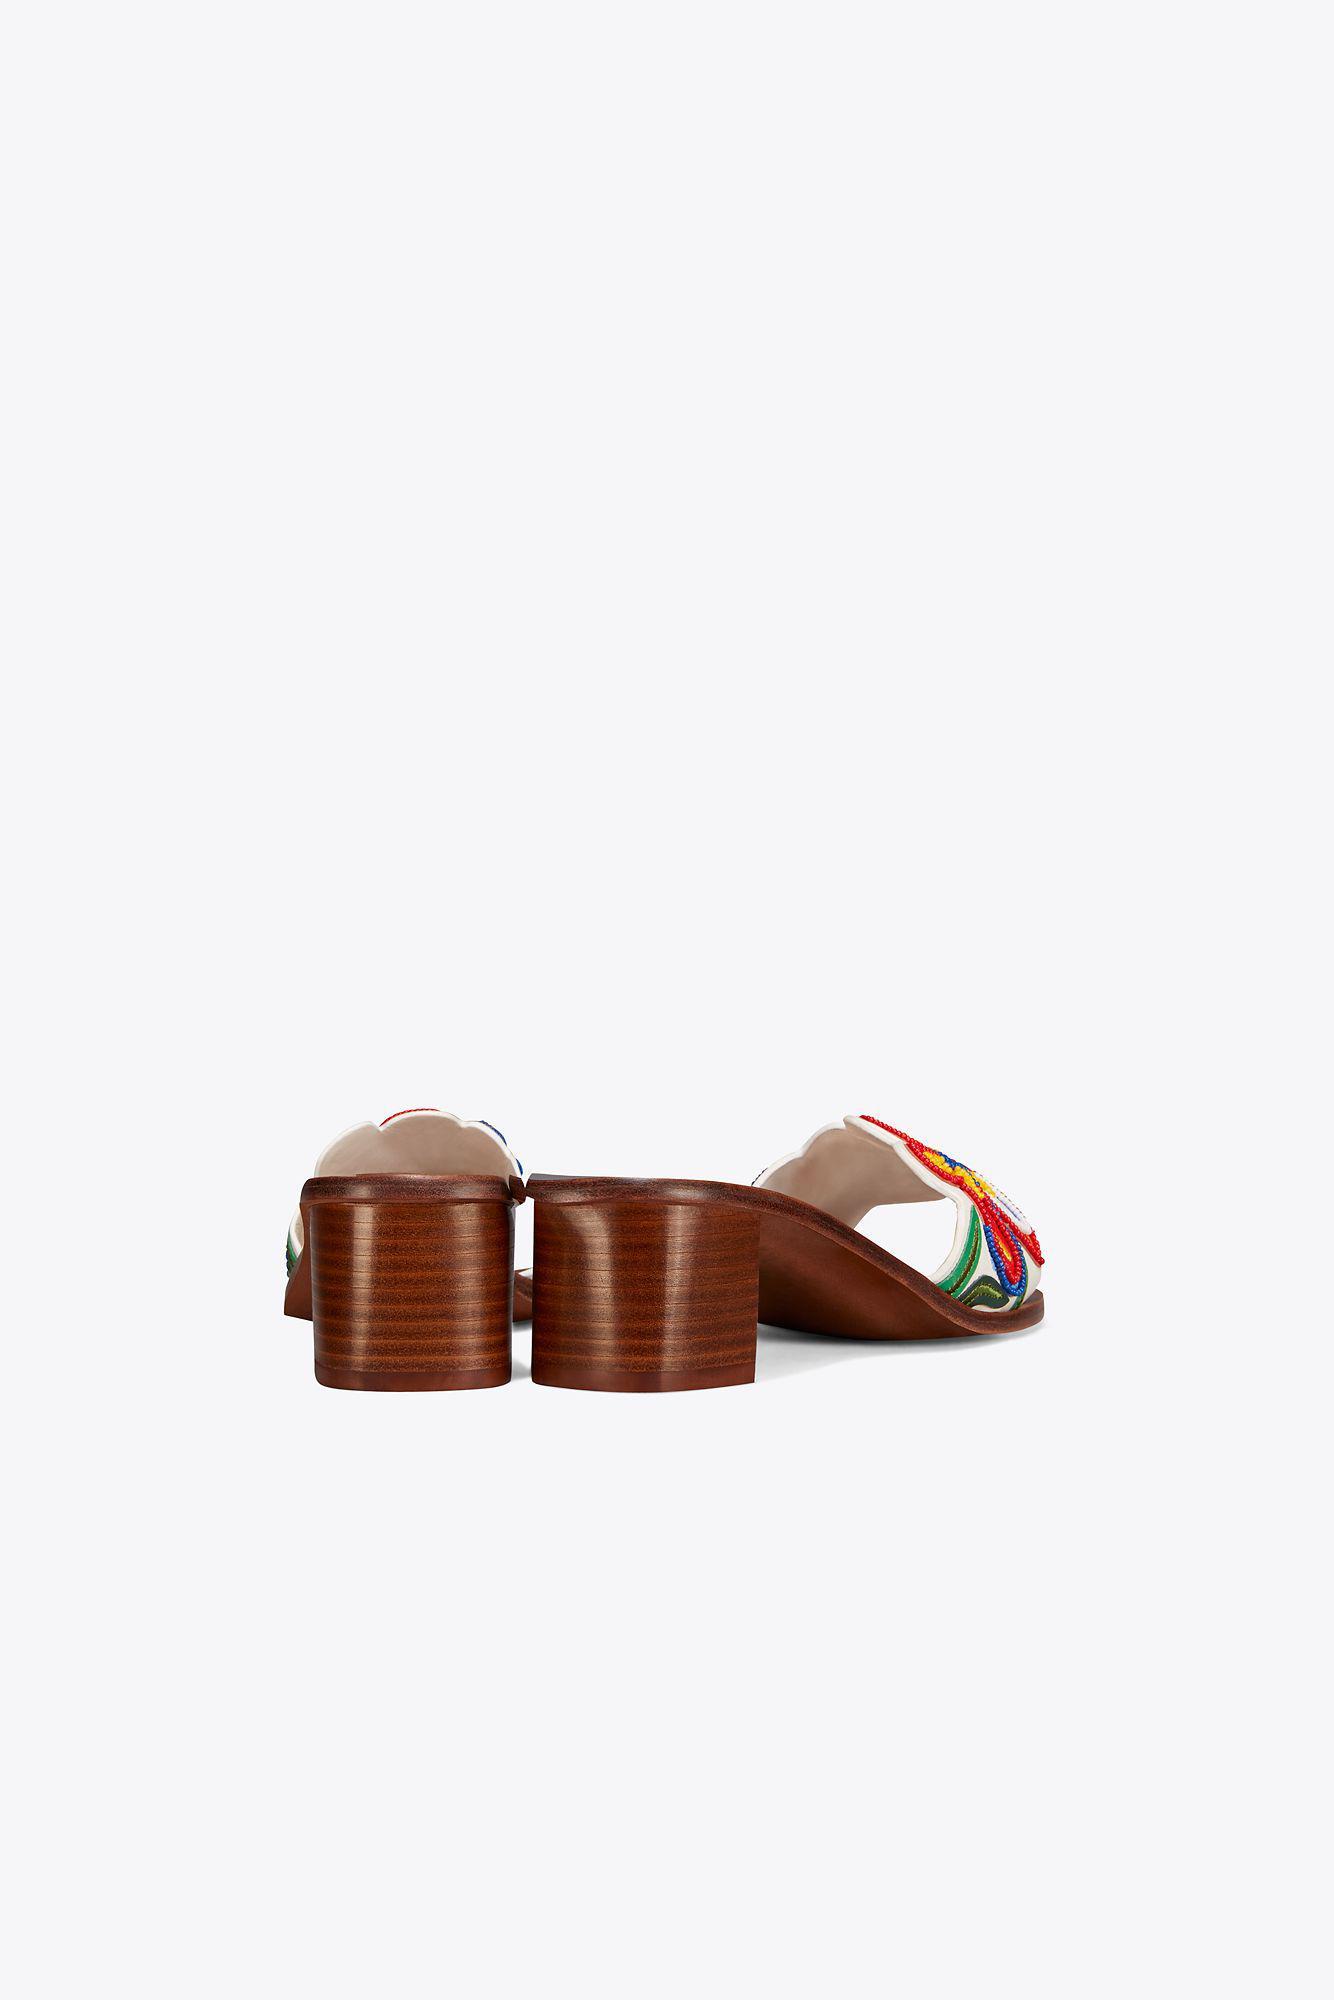 569a3af01d6e1 Lyst - Tory Burch Bianca Mid-heel Slide